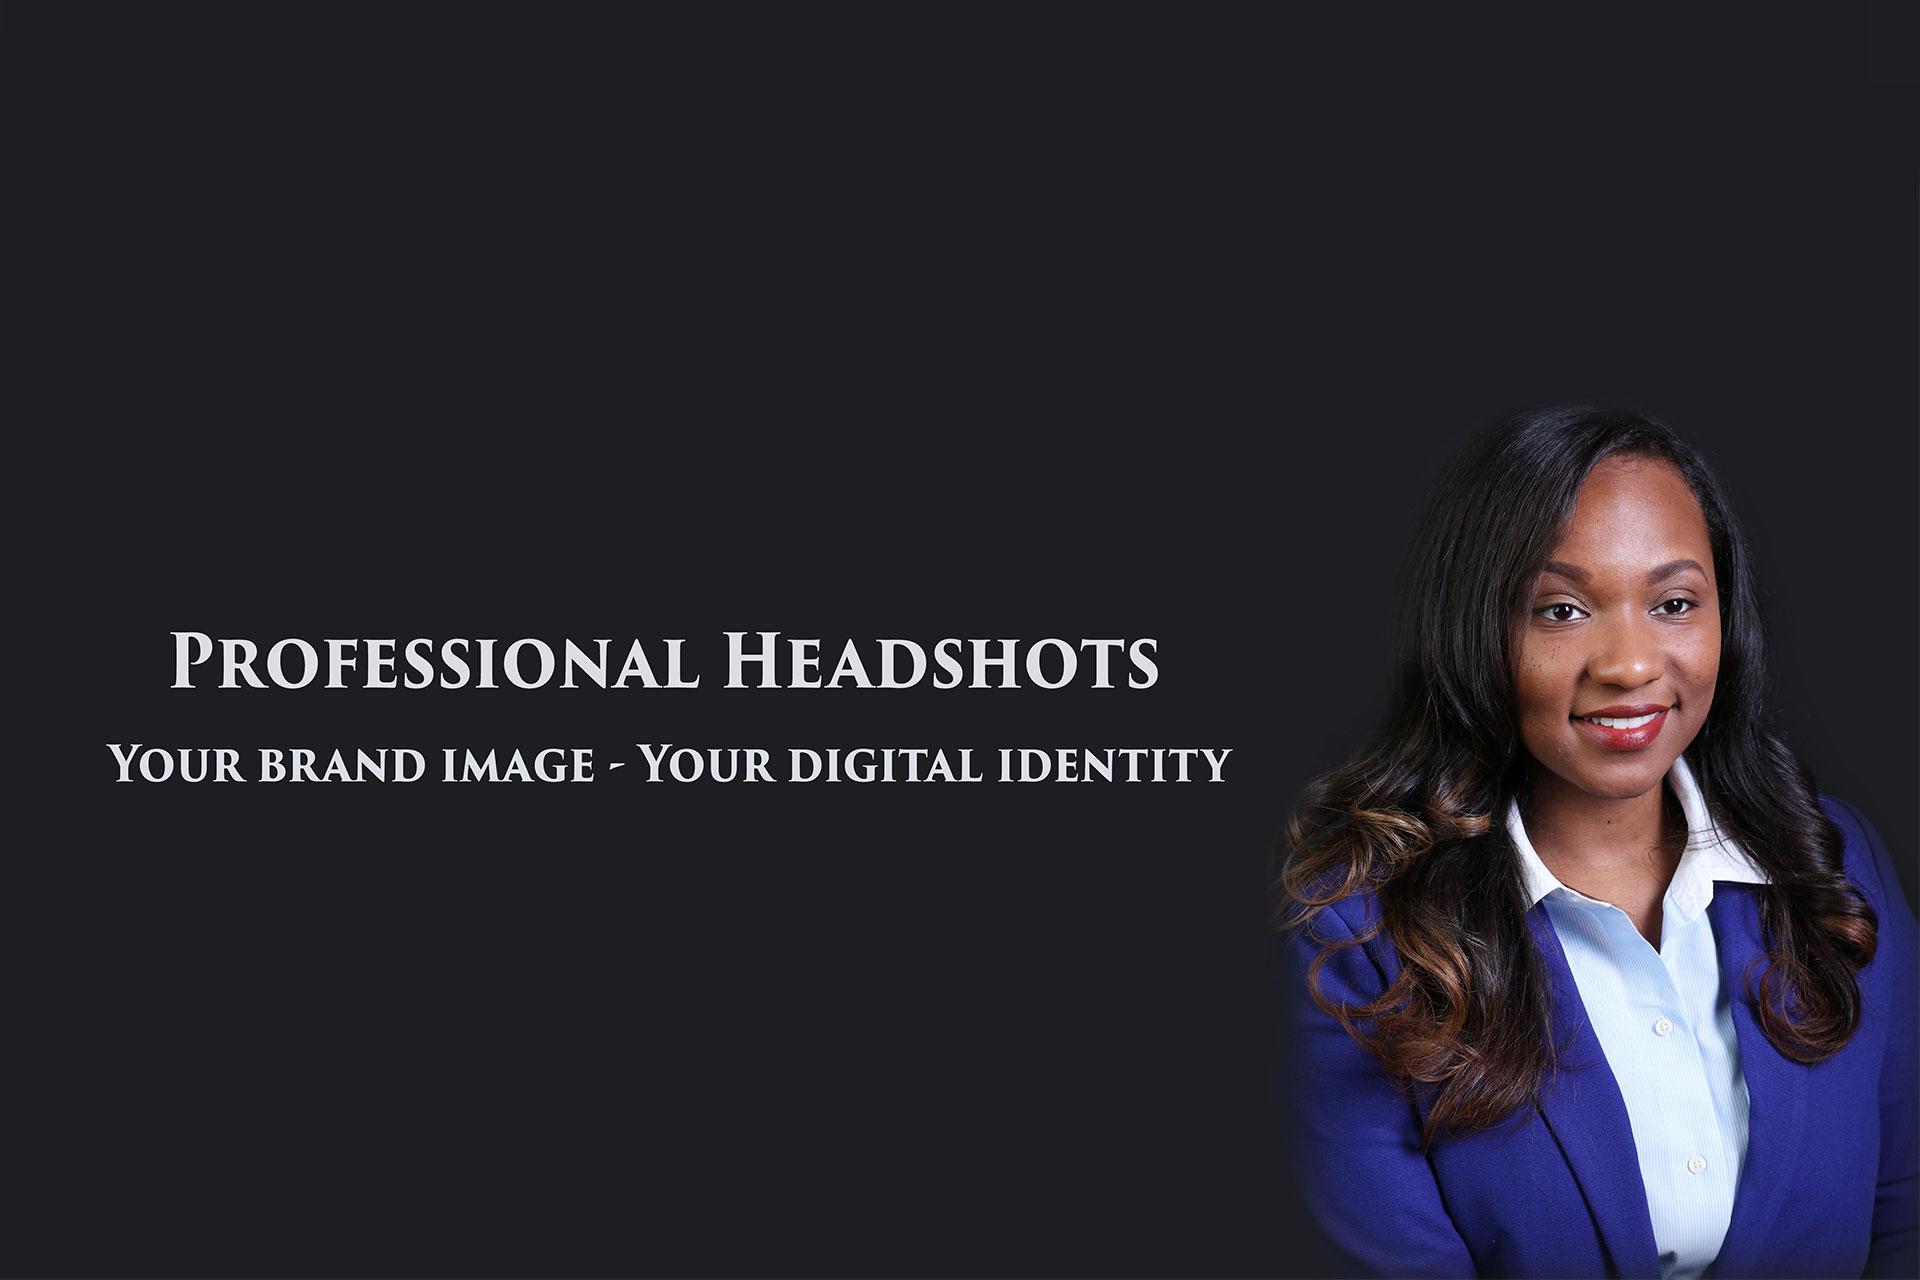 houston-pearland-corporate-professional-headshot